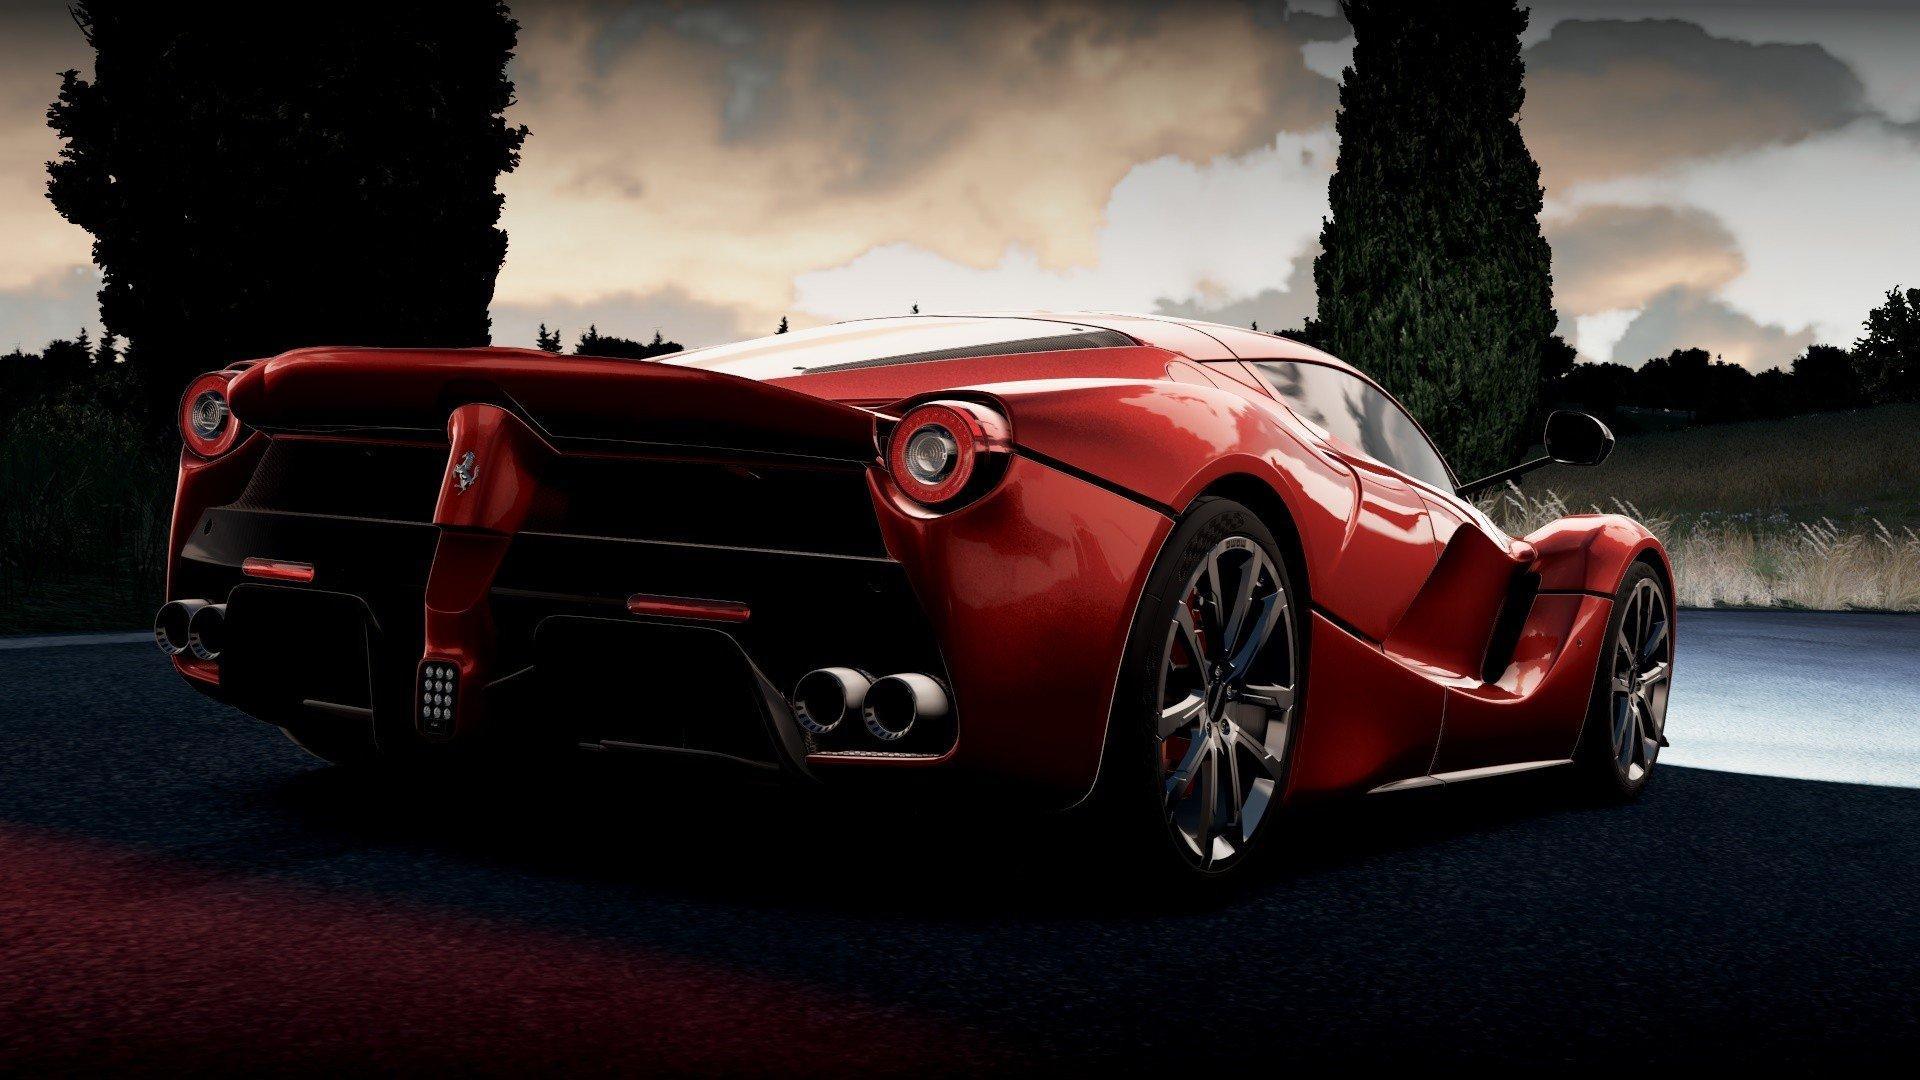 Ferrari 458 Italia Wallpaper Hd Ferrari Laferrari Wallpapers Hd Pixelstalk Net